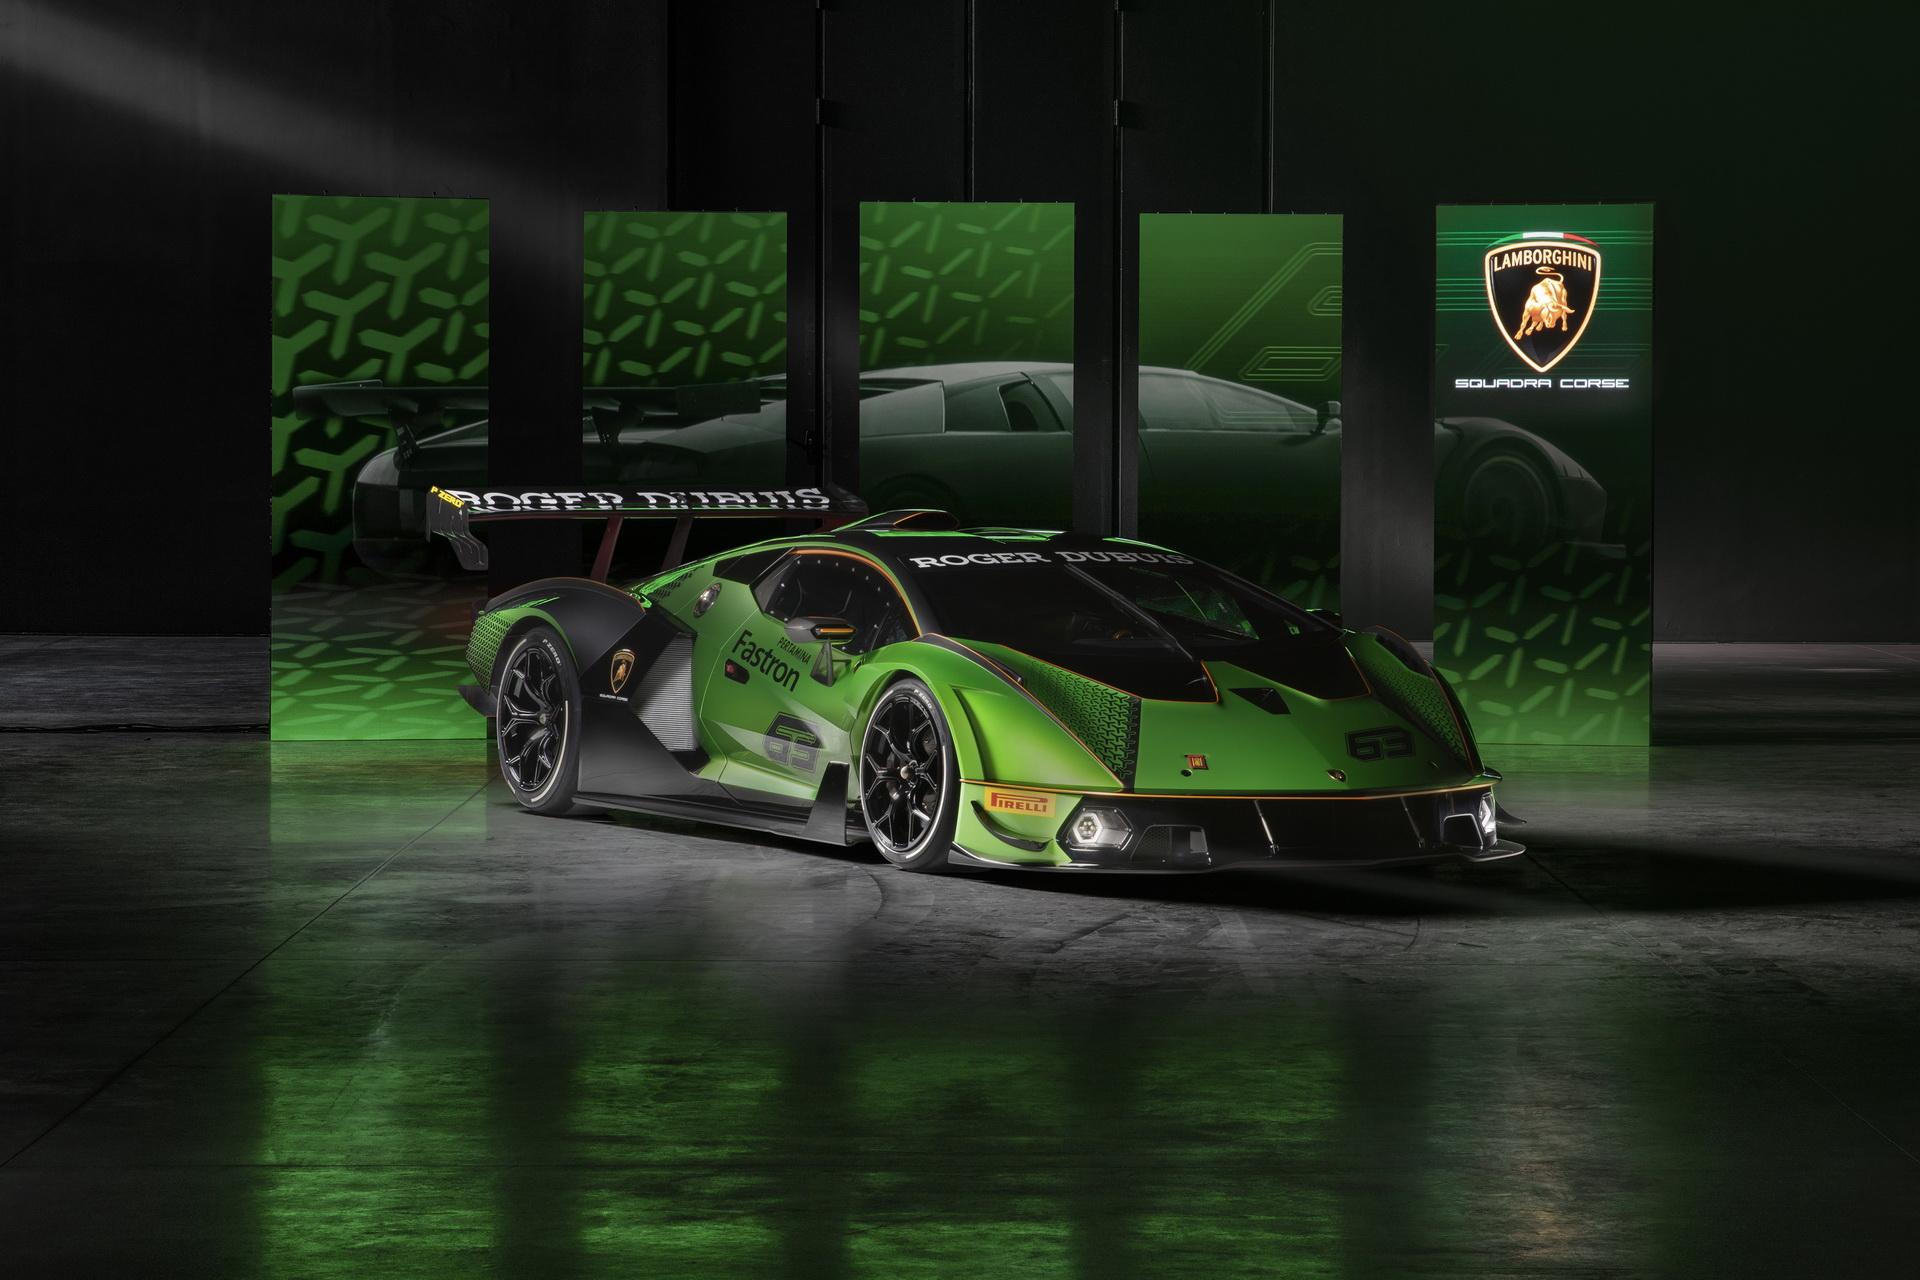 Самому мощному суперкару Lamborghini не разрешили выезжать на дороги